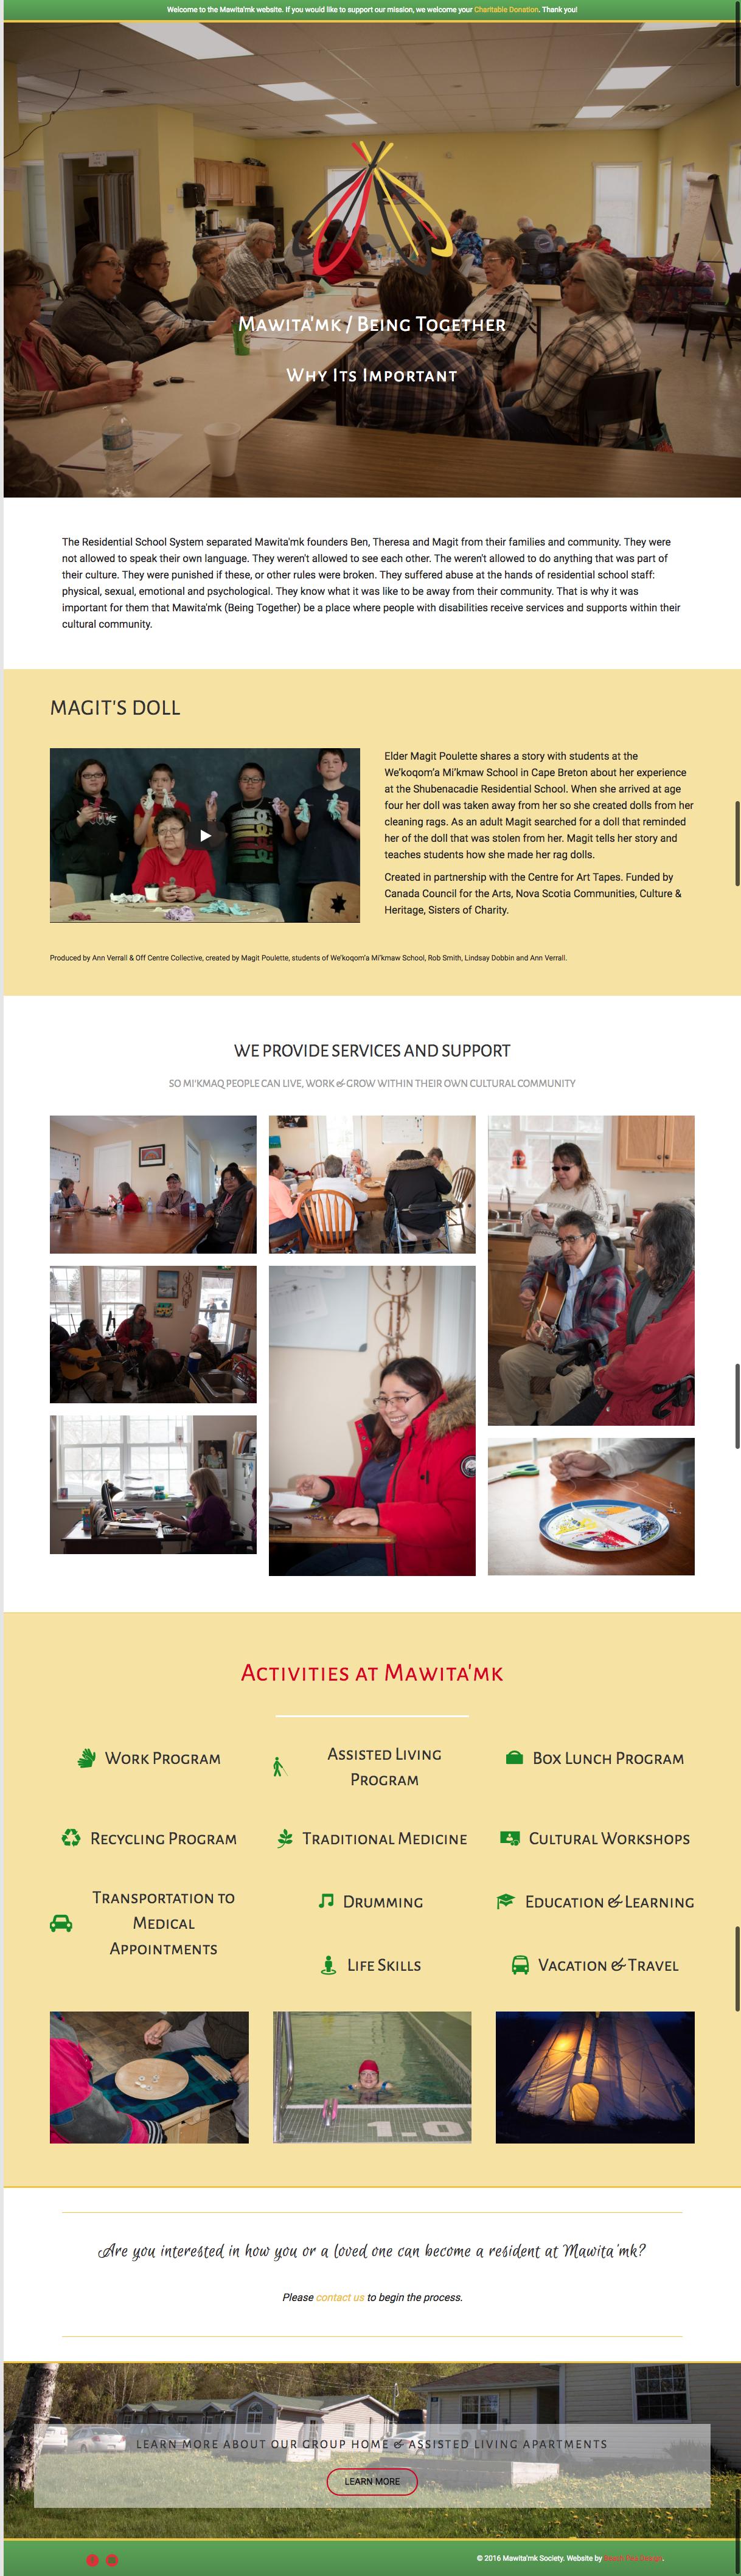 Website Design by Beach Pea Design for Mawita'mk Society